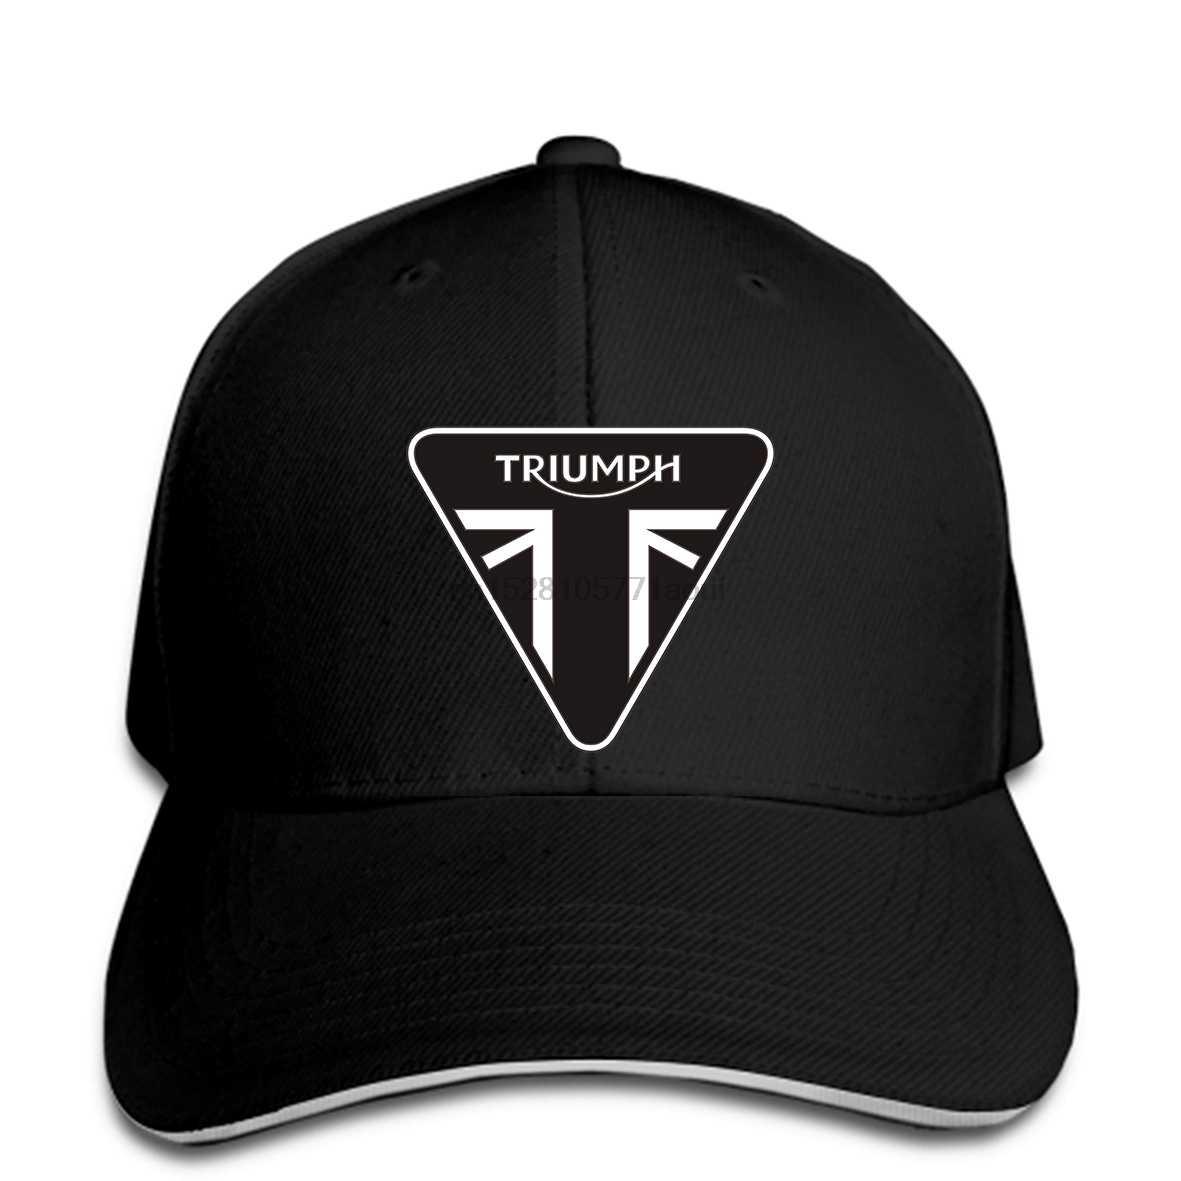 2ff722e14 Detail Feedback Questions about hip hop Baseball caps Funny Men hat ...